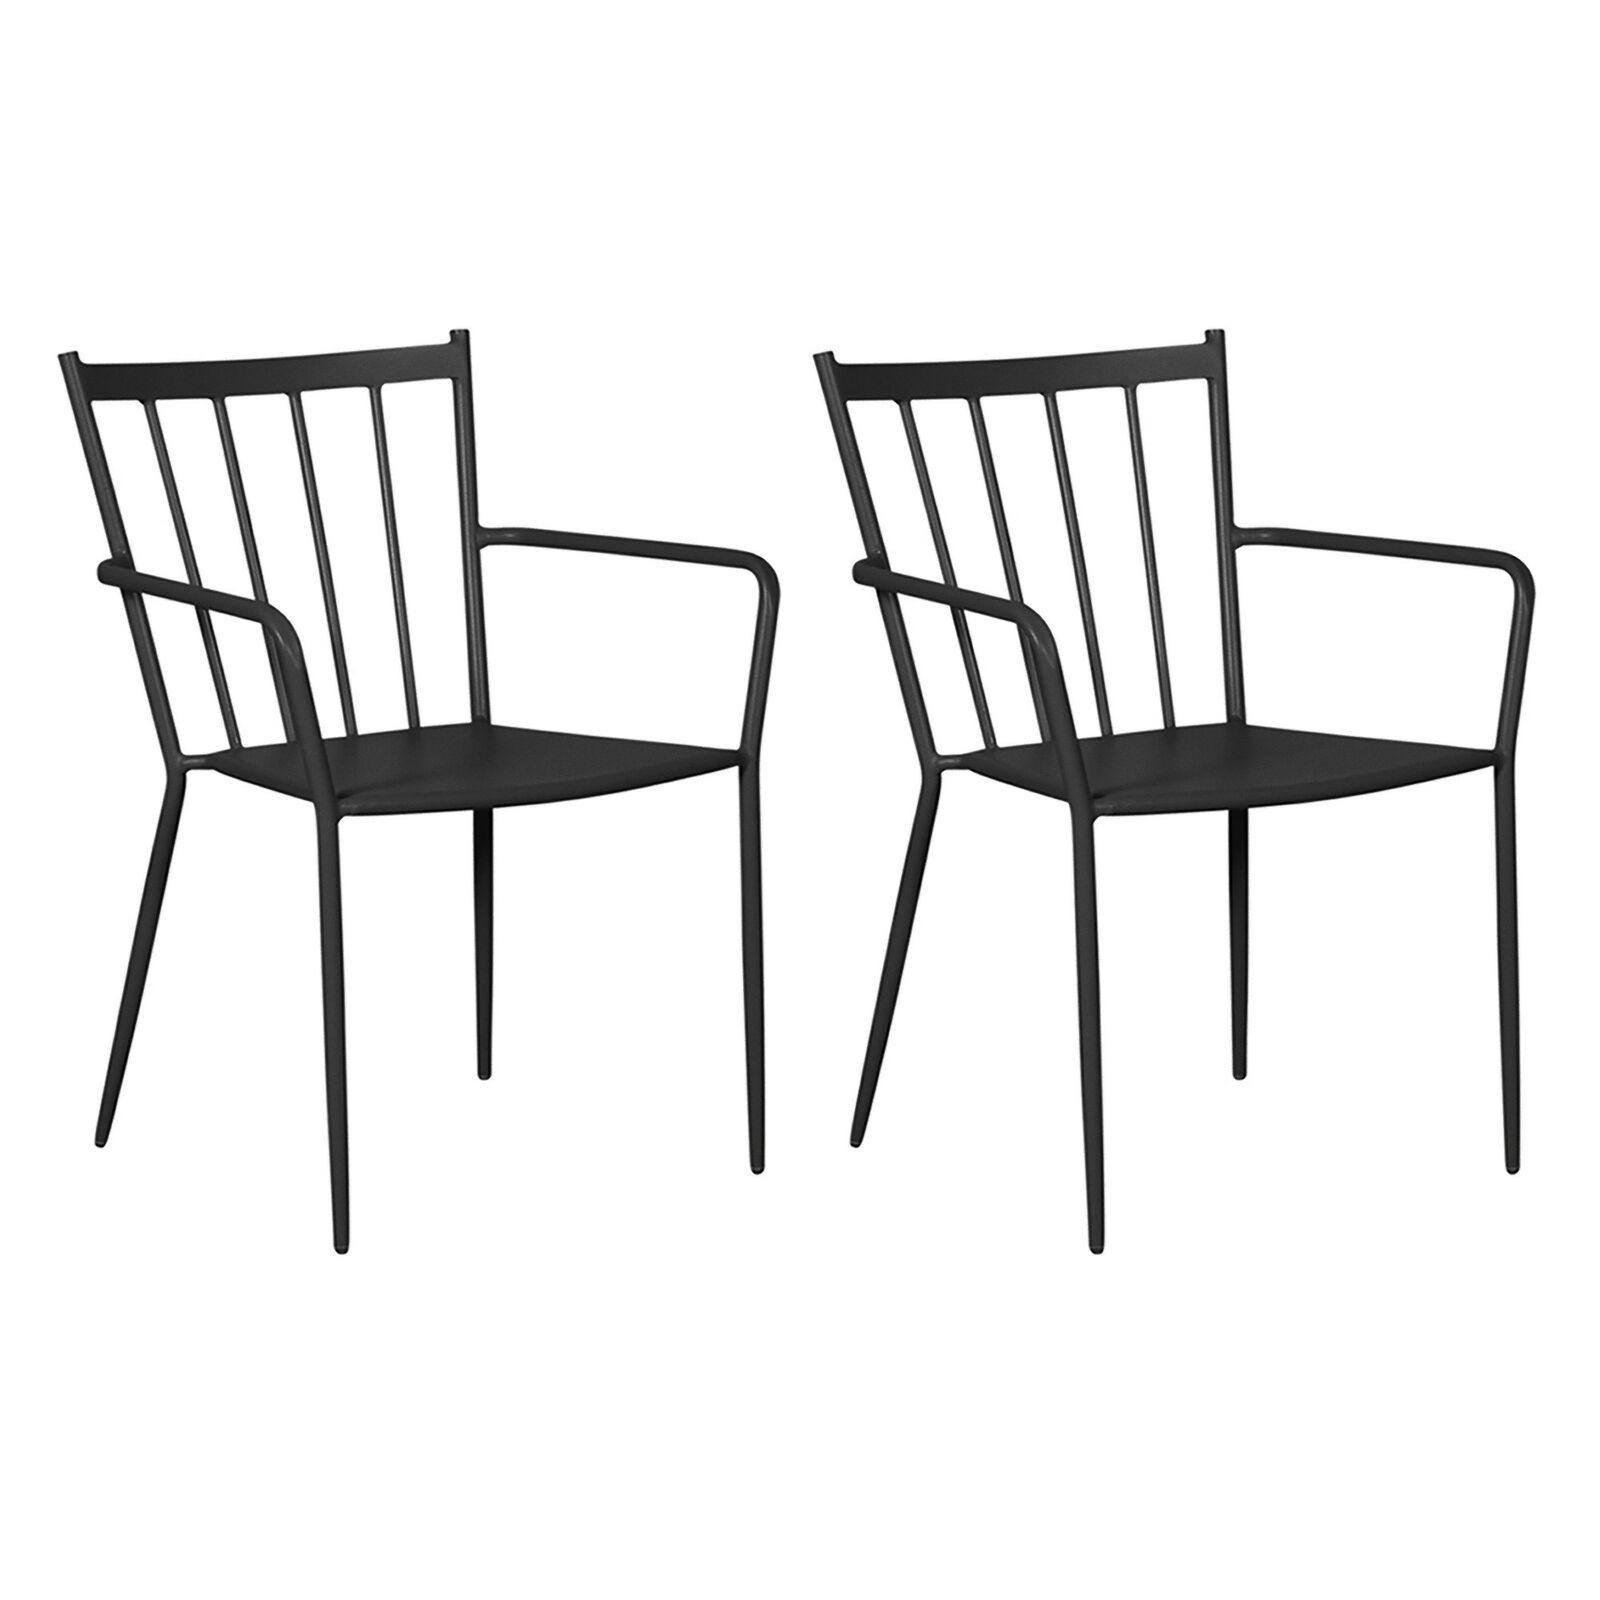 2x Gartenstuhl Irma Stapelstuhl Metall Garten Terrasse Stuhl Set Stühle schwarz